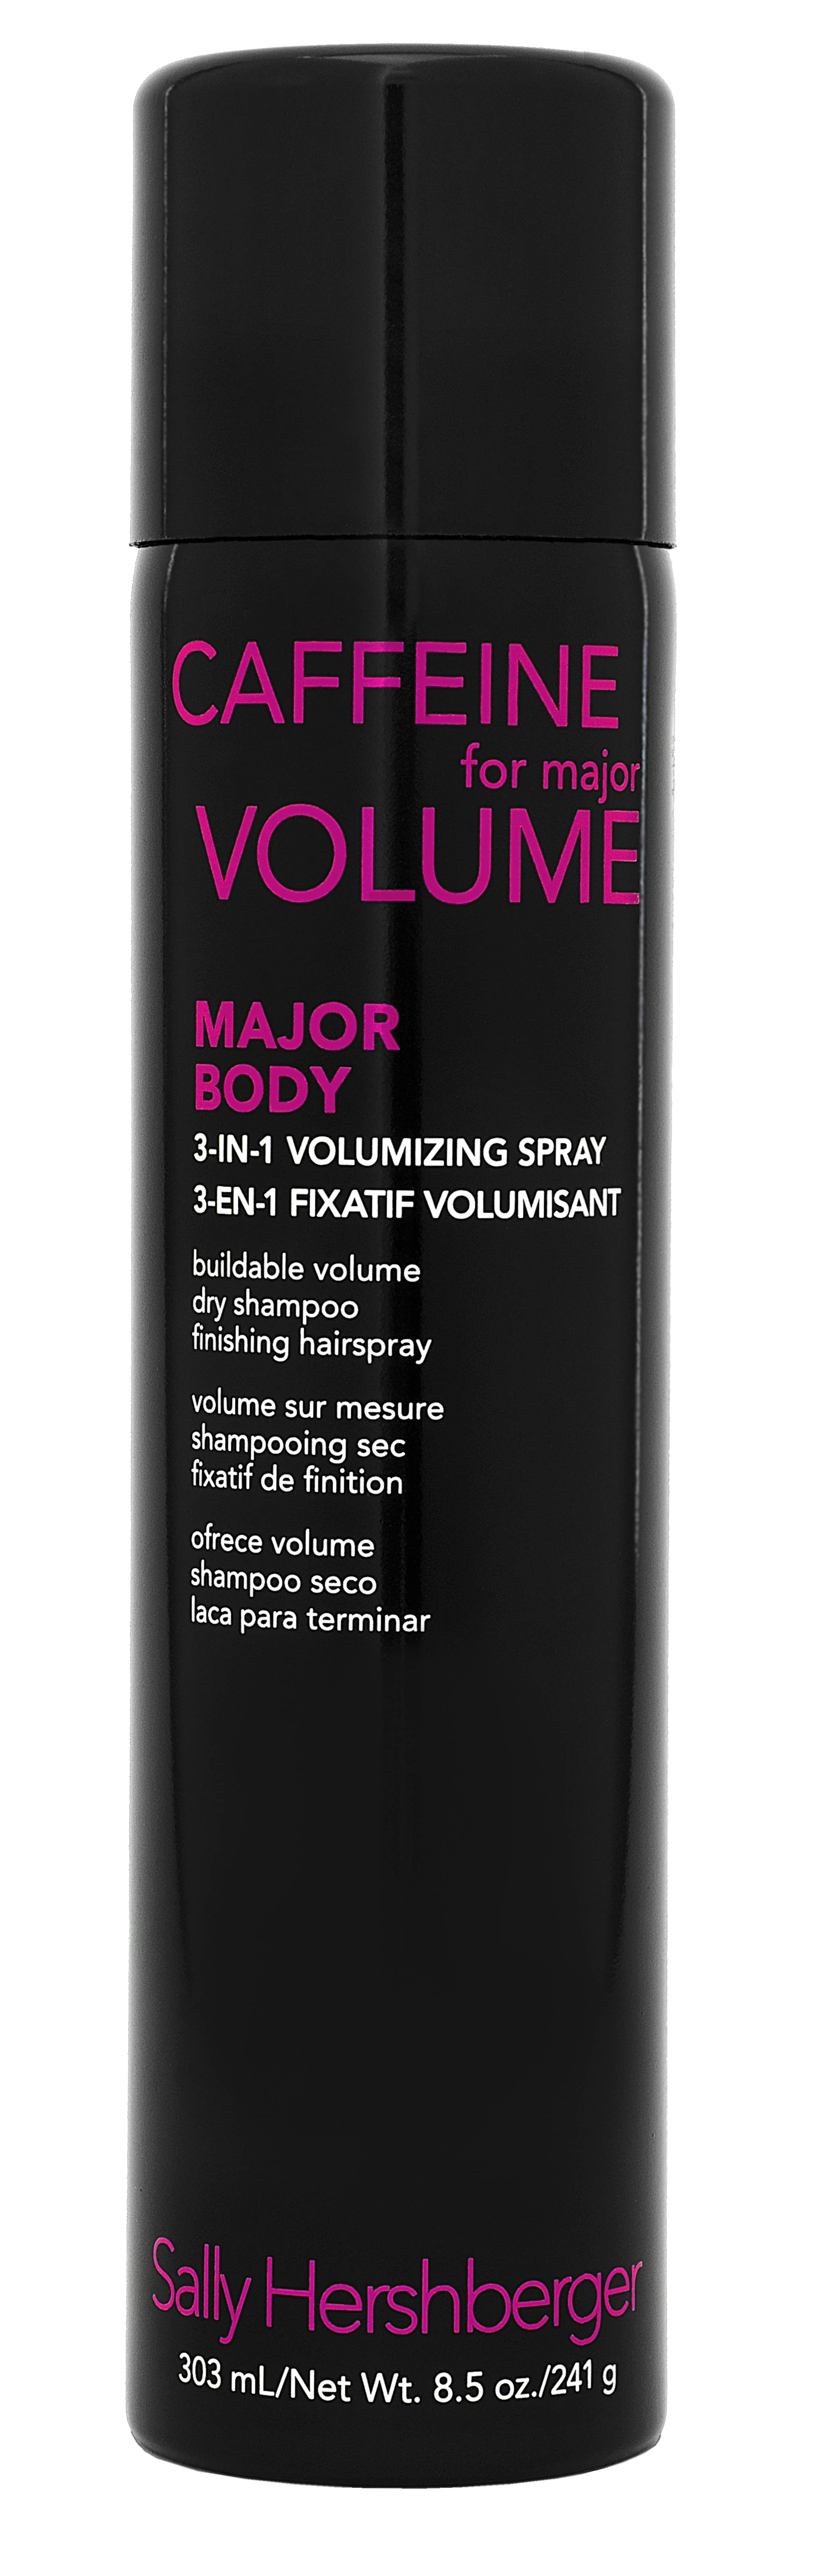 Sally Hershberger Major Body 3-in-1 Volumizing Spray